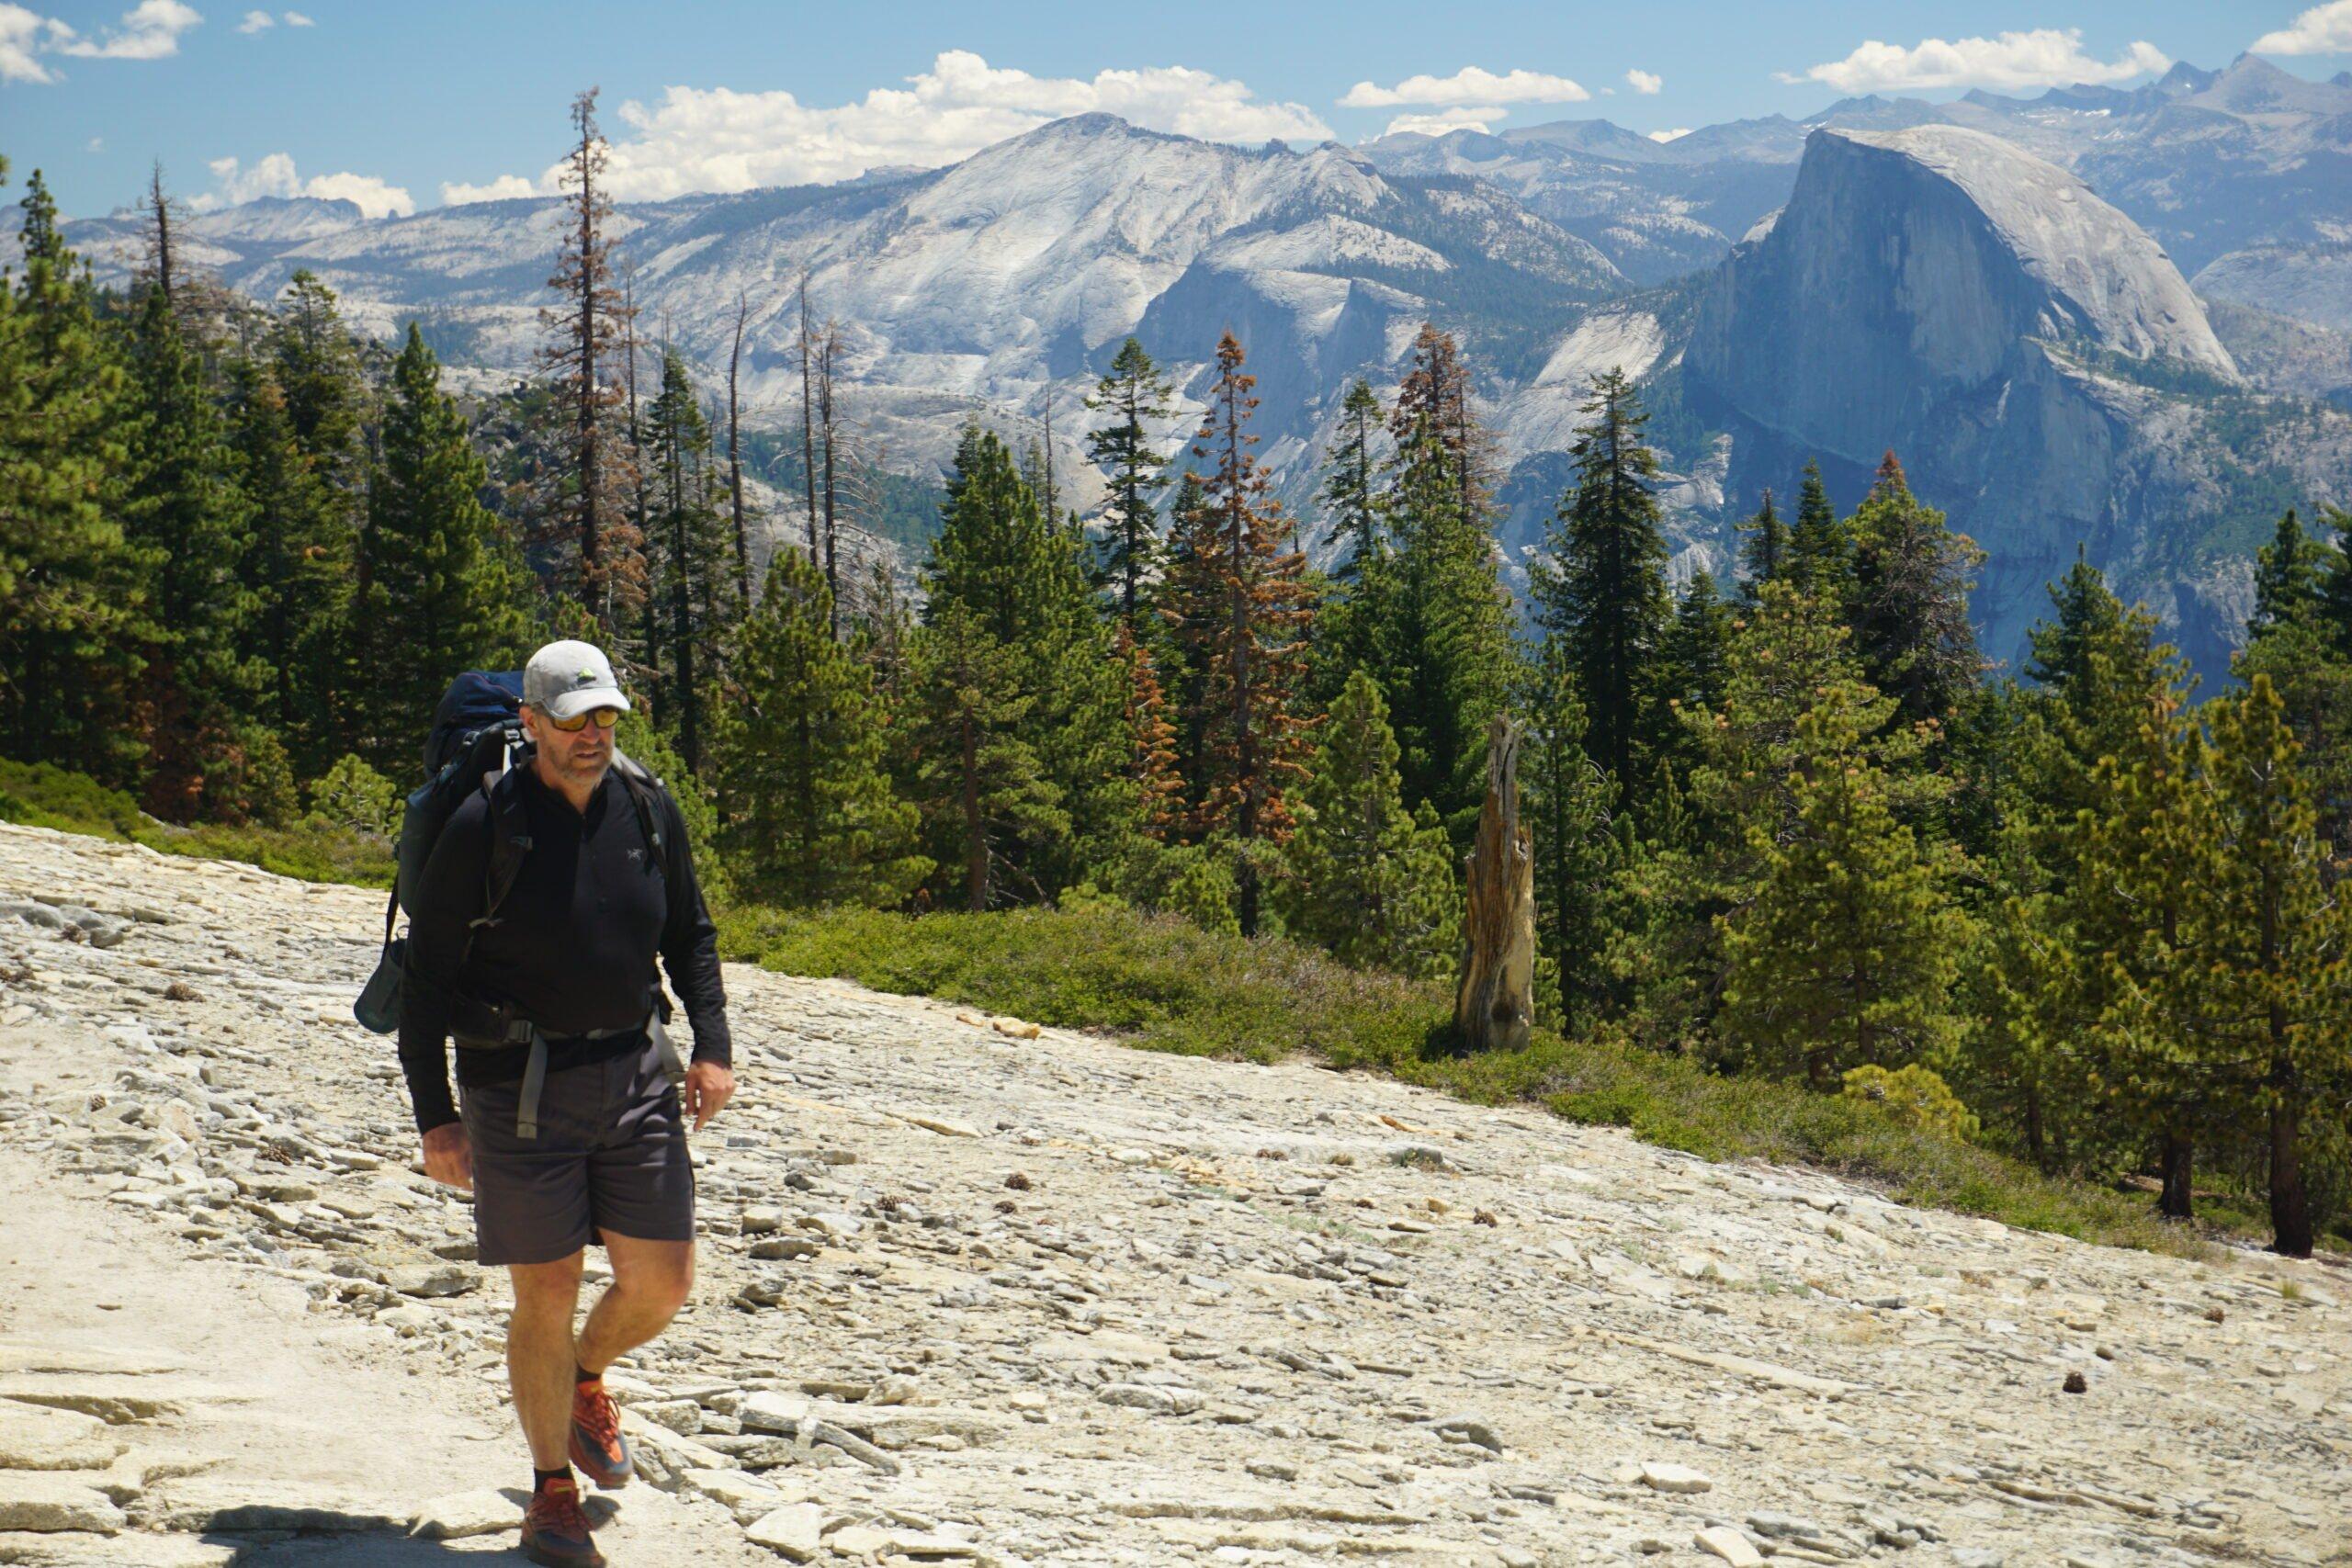 Keith Robinson nears the top of El Capitan in Yosemite National Park